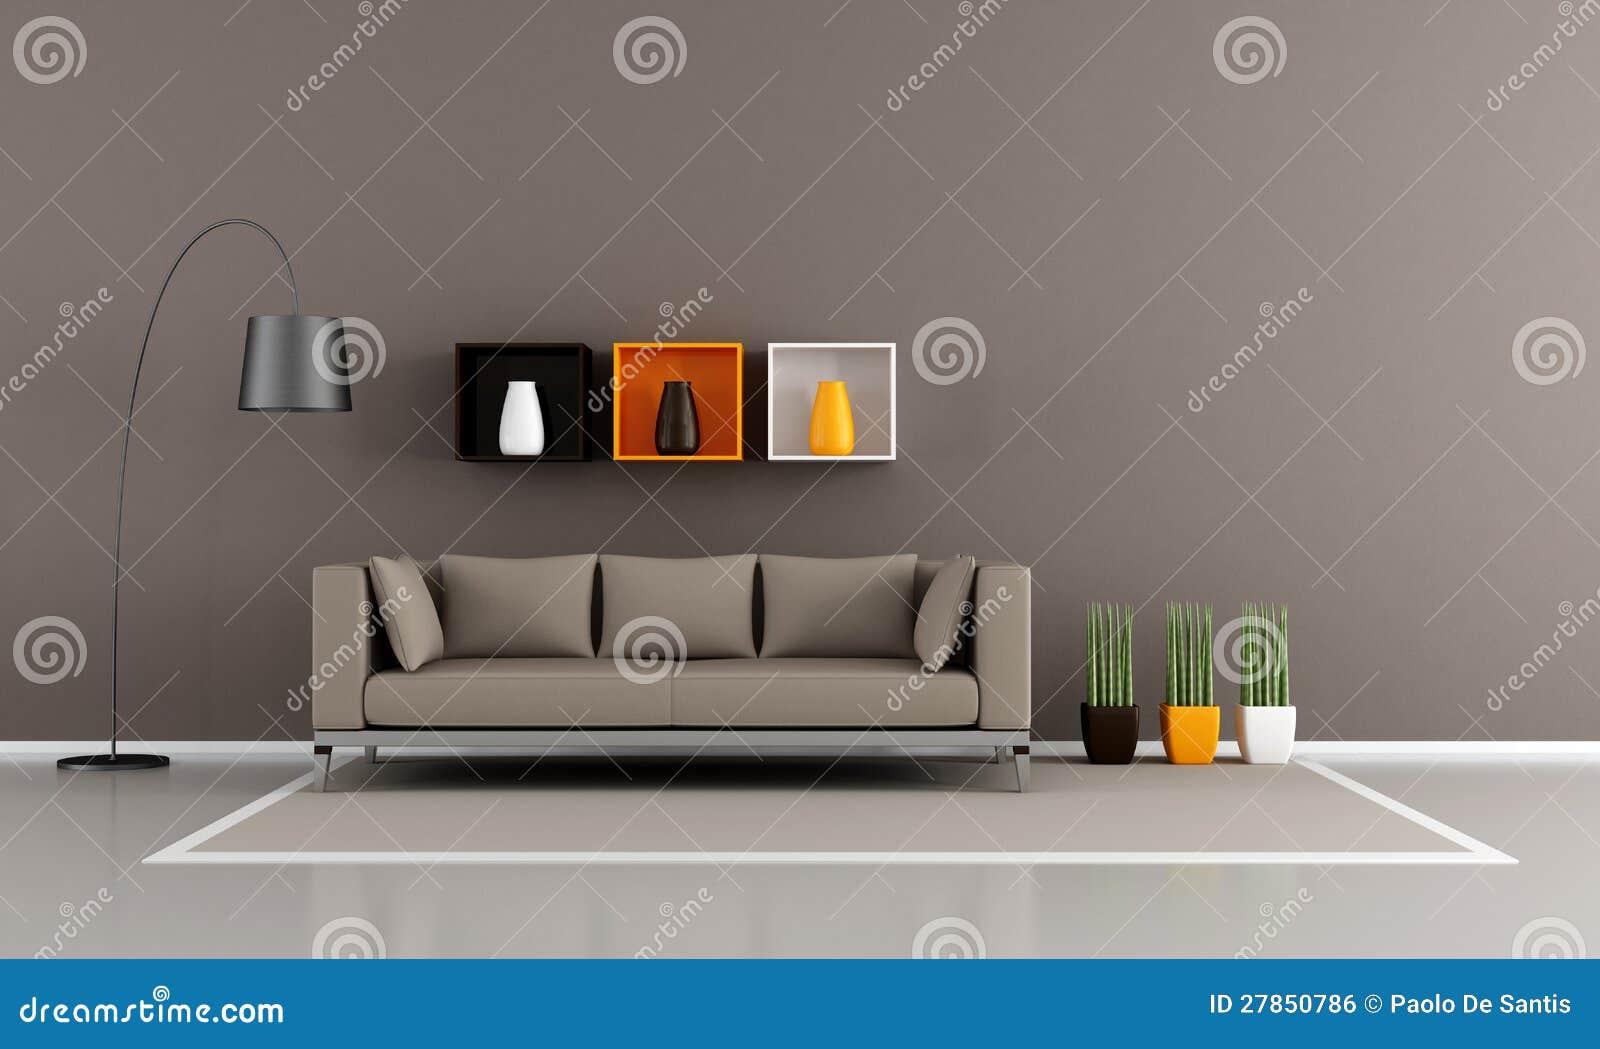 Minimalistische bruine woonkamer royalty vrije stock afbeelding afbeelding 27850786 - Afbeelding eigentijdse woonkamer ...